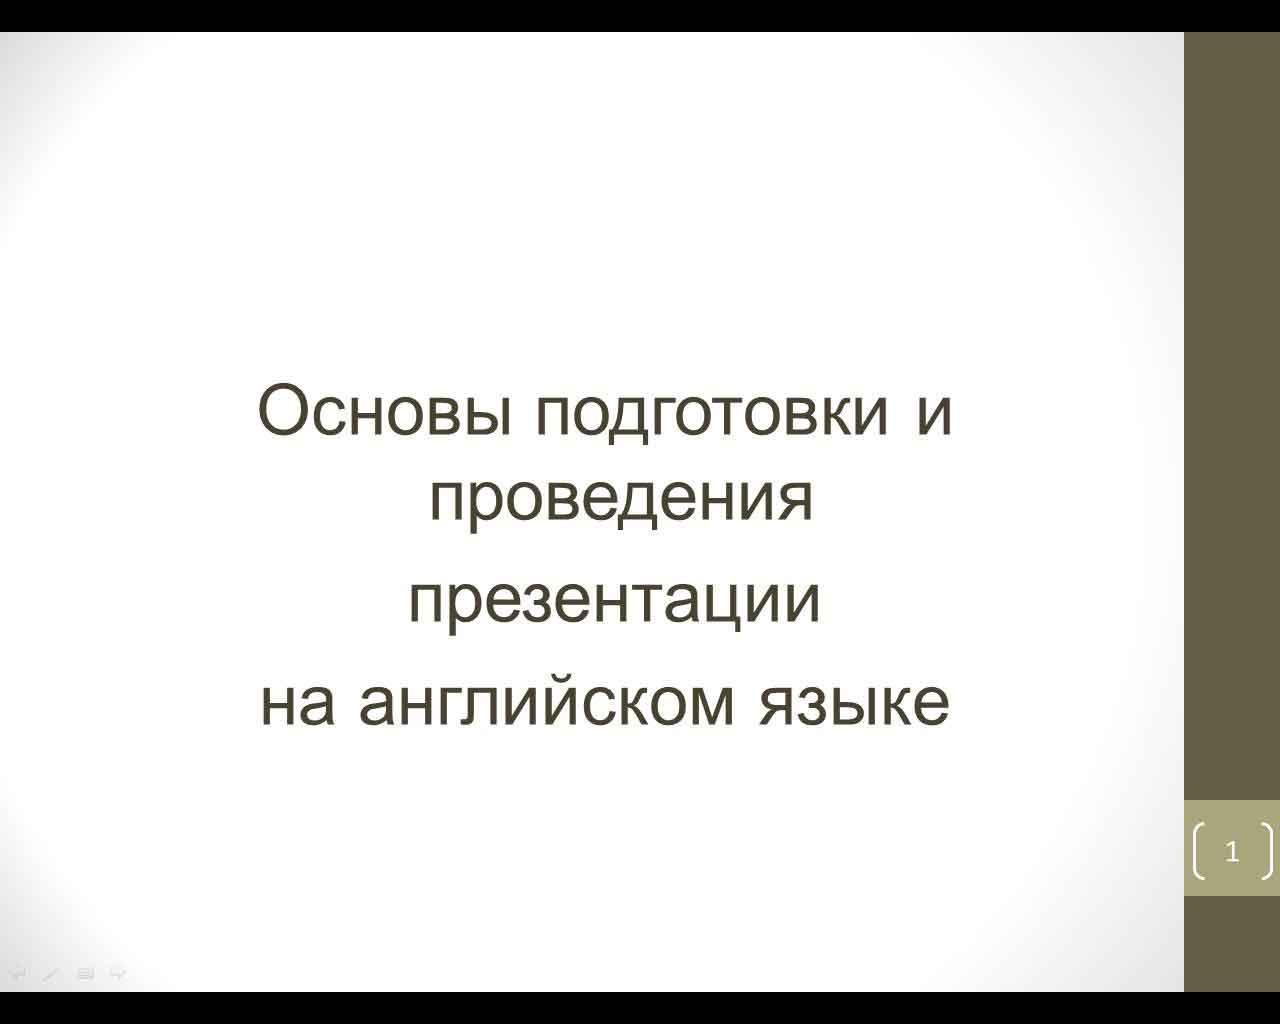 Ivostrikova.com - что такое мультимедийная презентация?